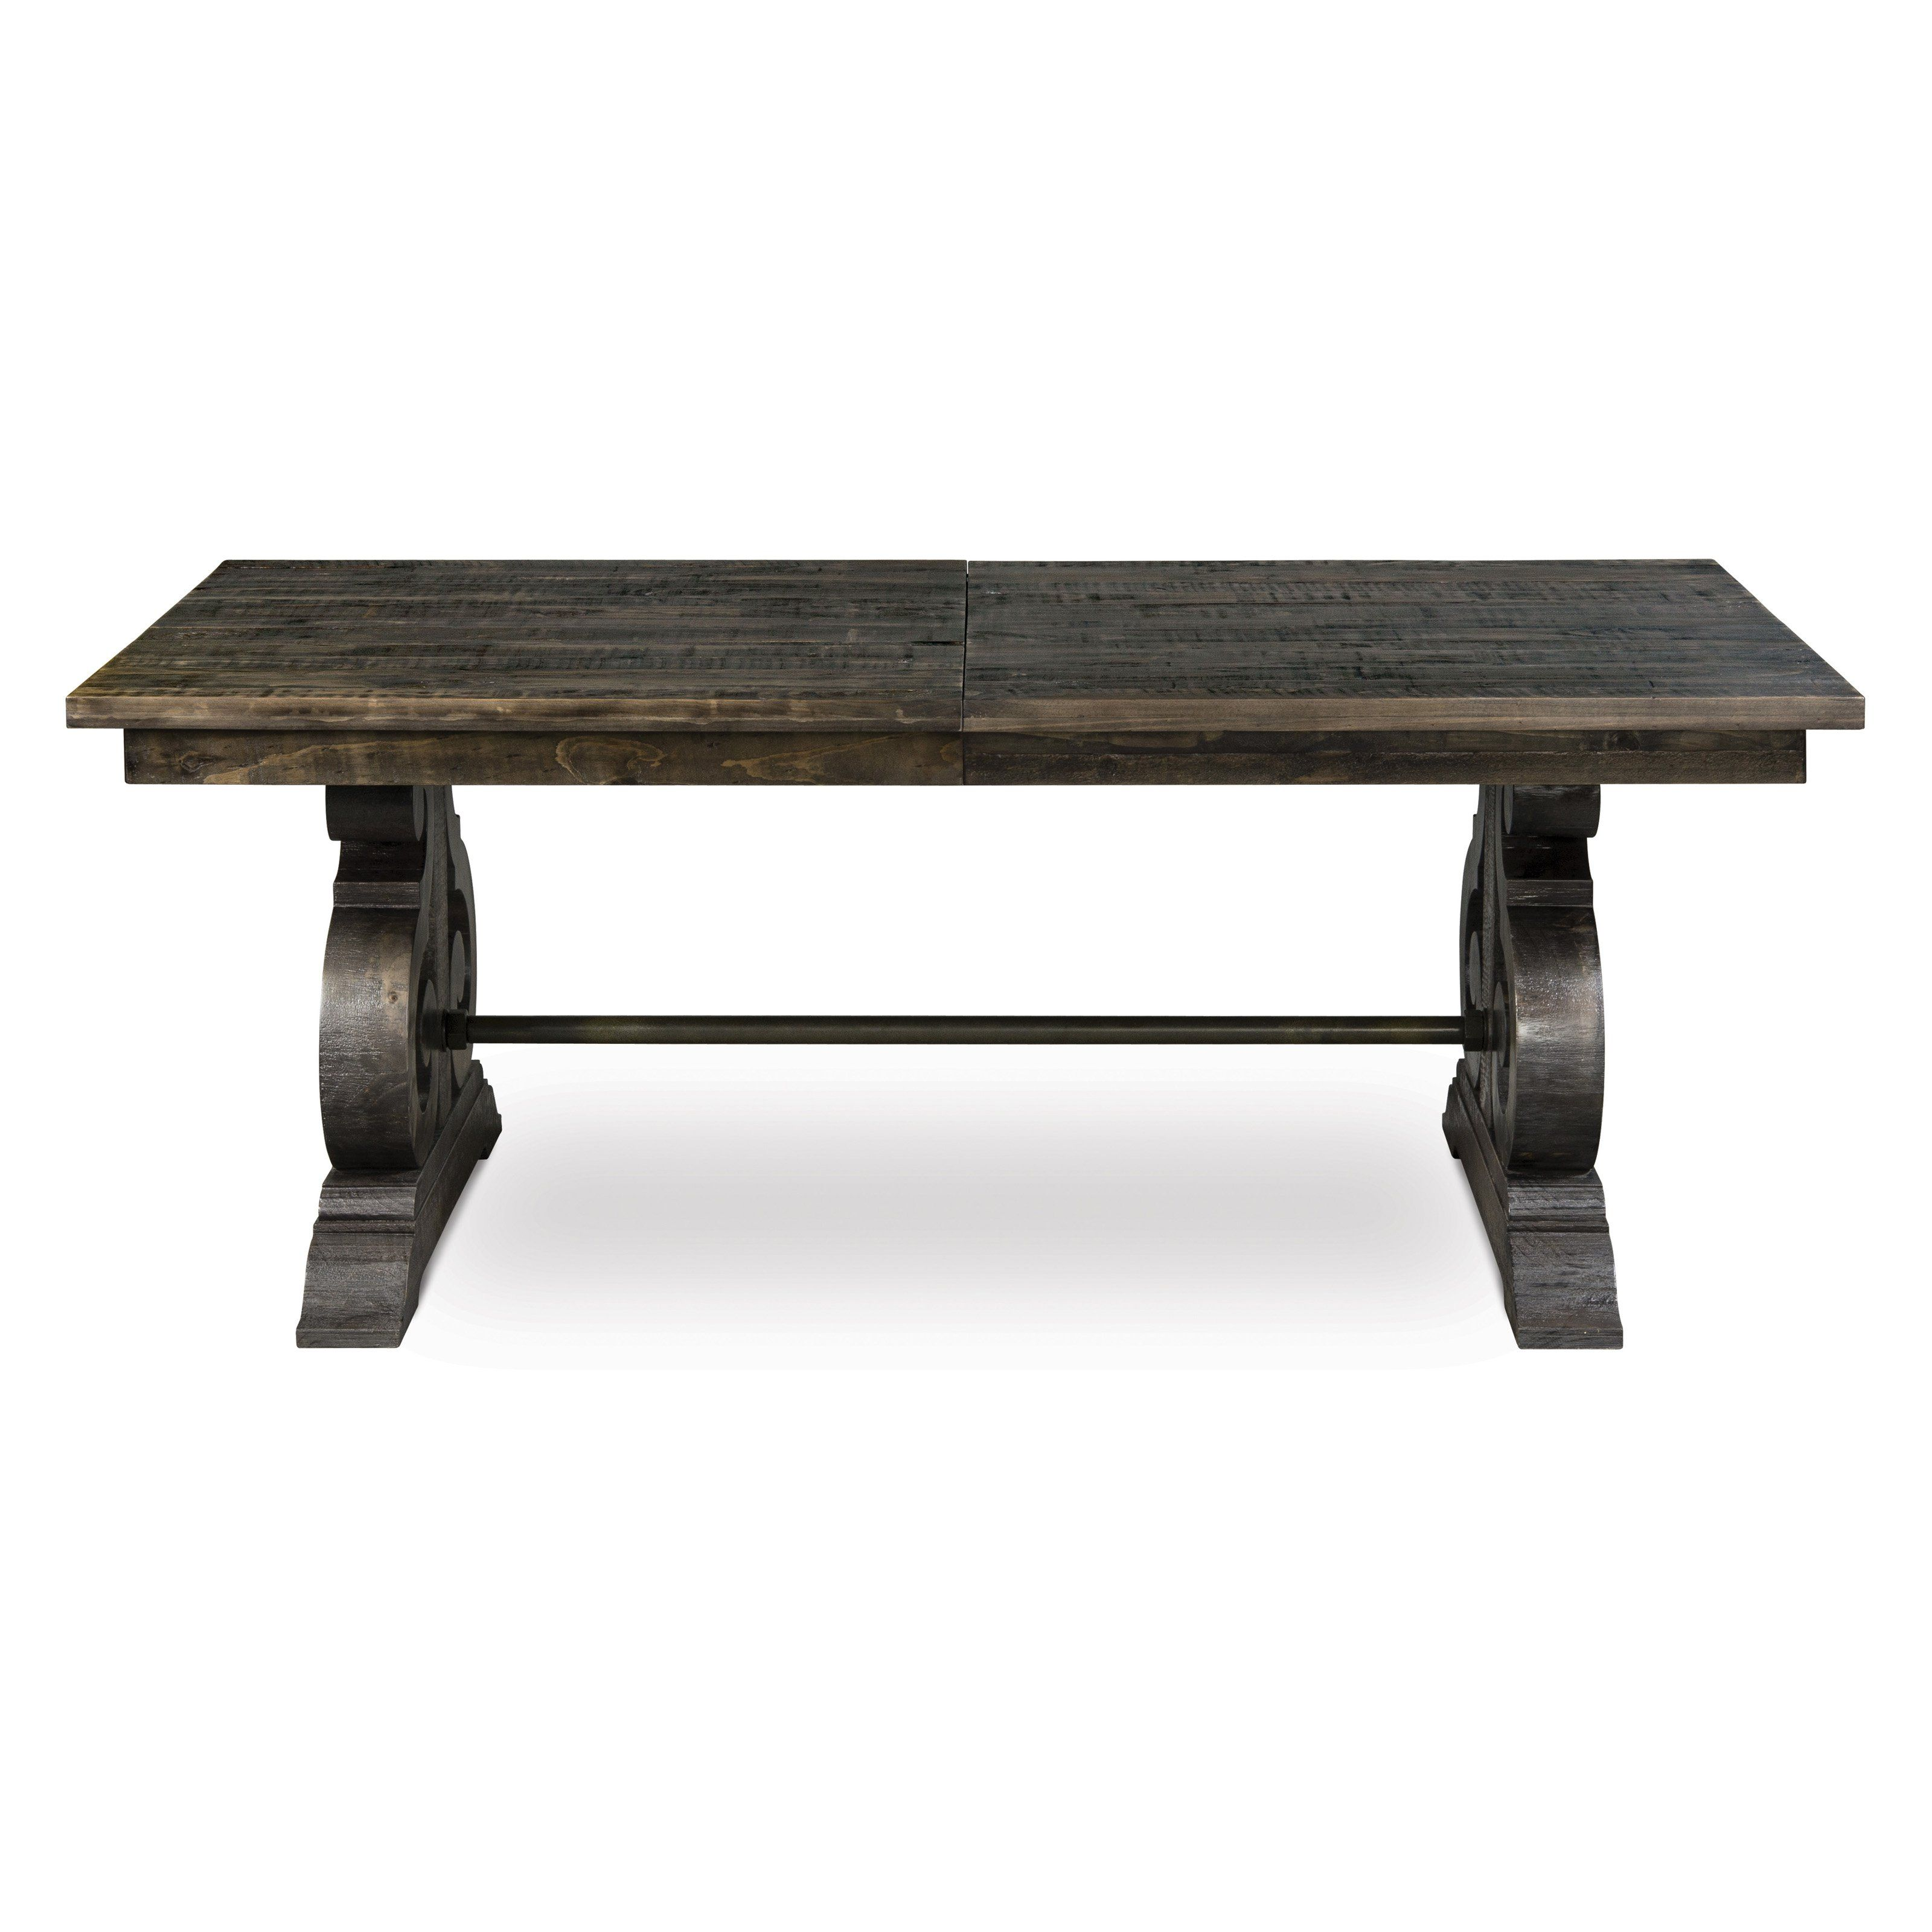 Magnussen Bellamy Wood Rectangular Dining Table Rustic and regal